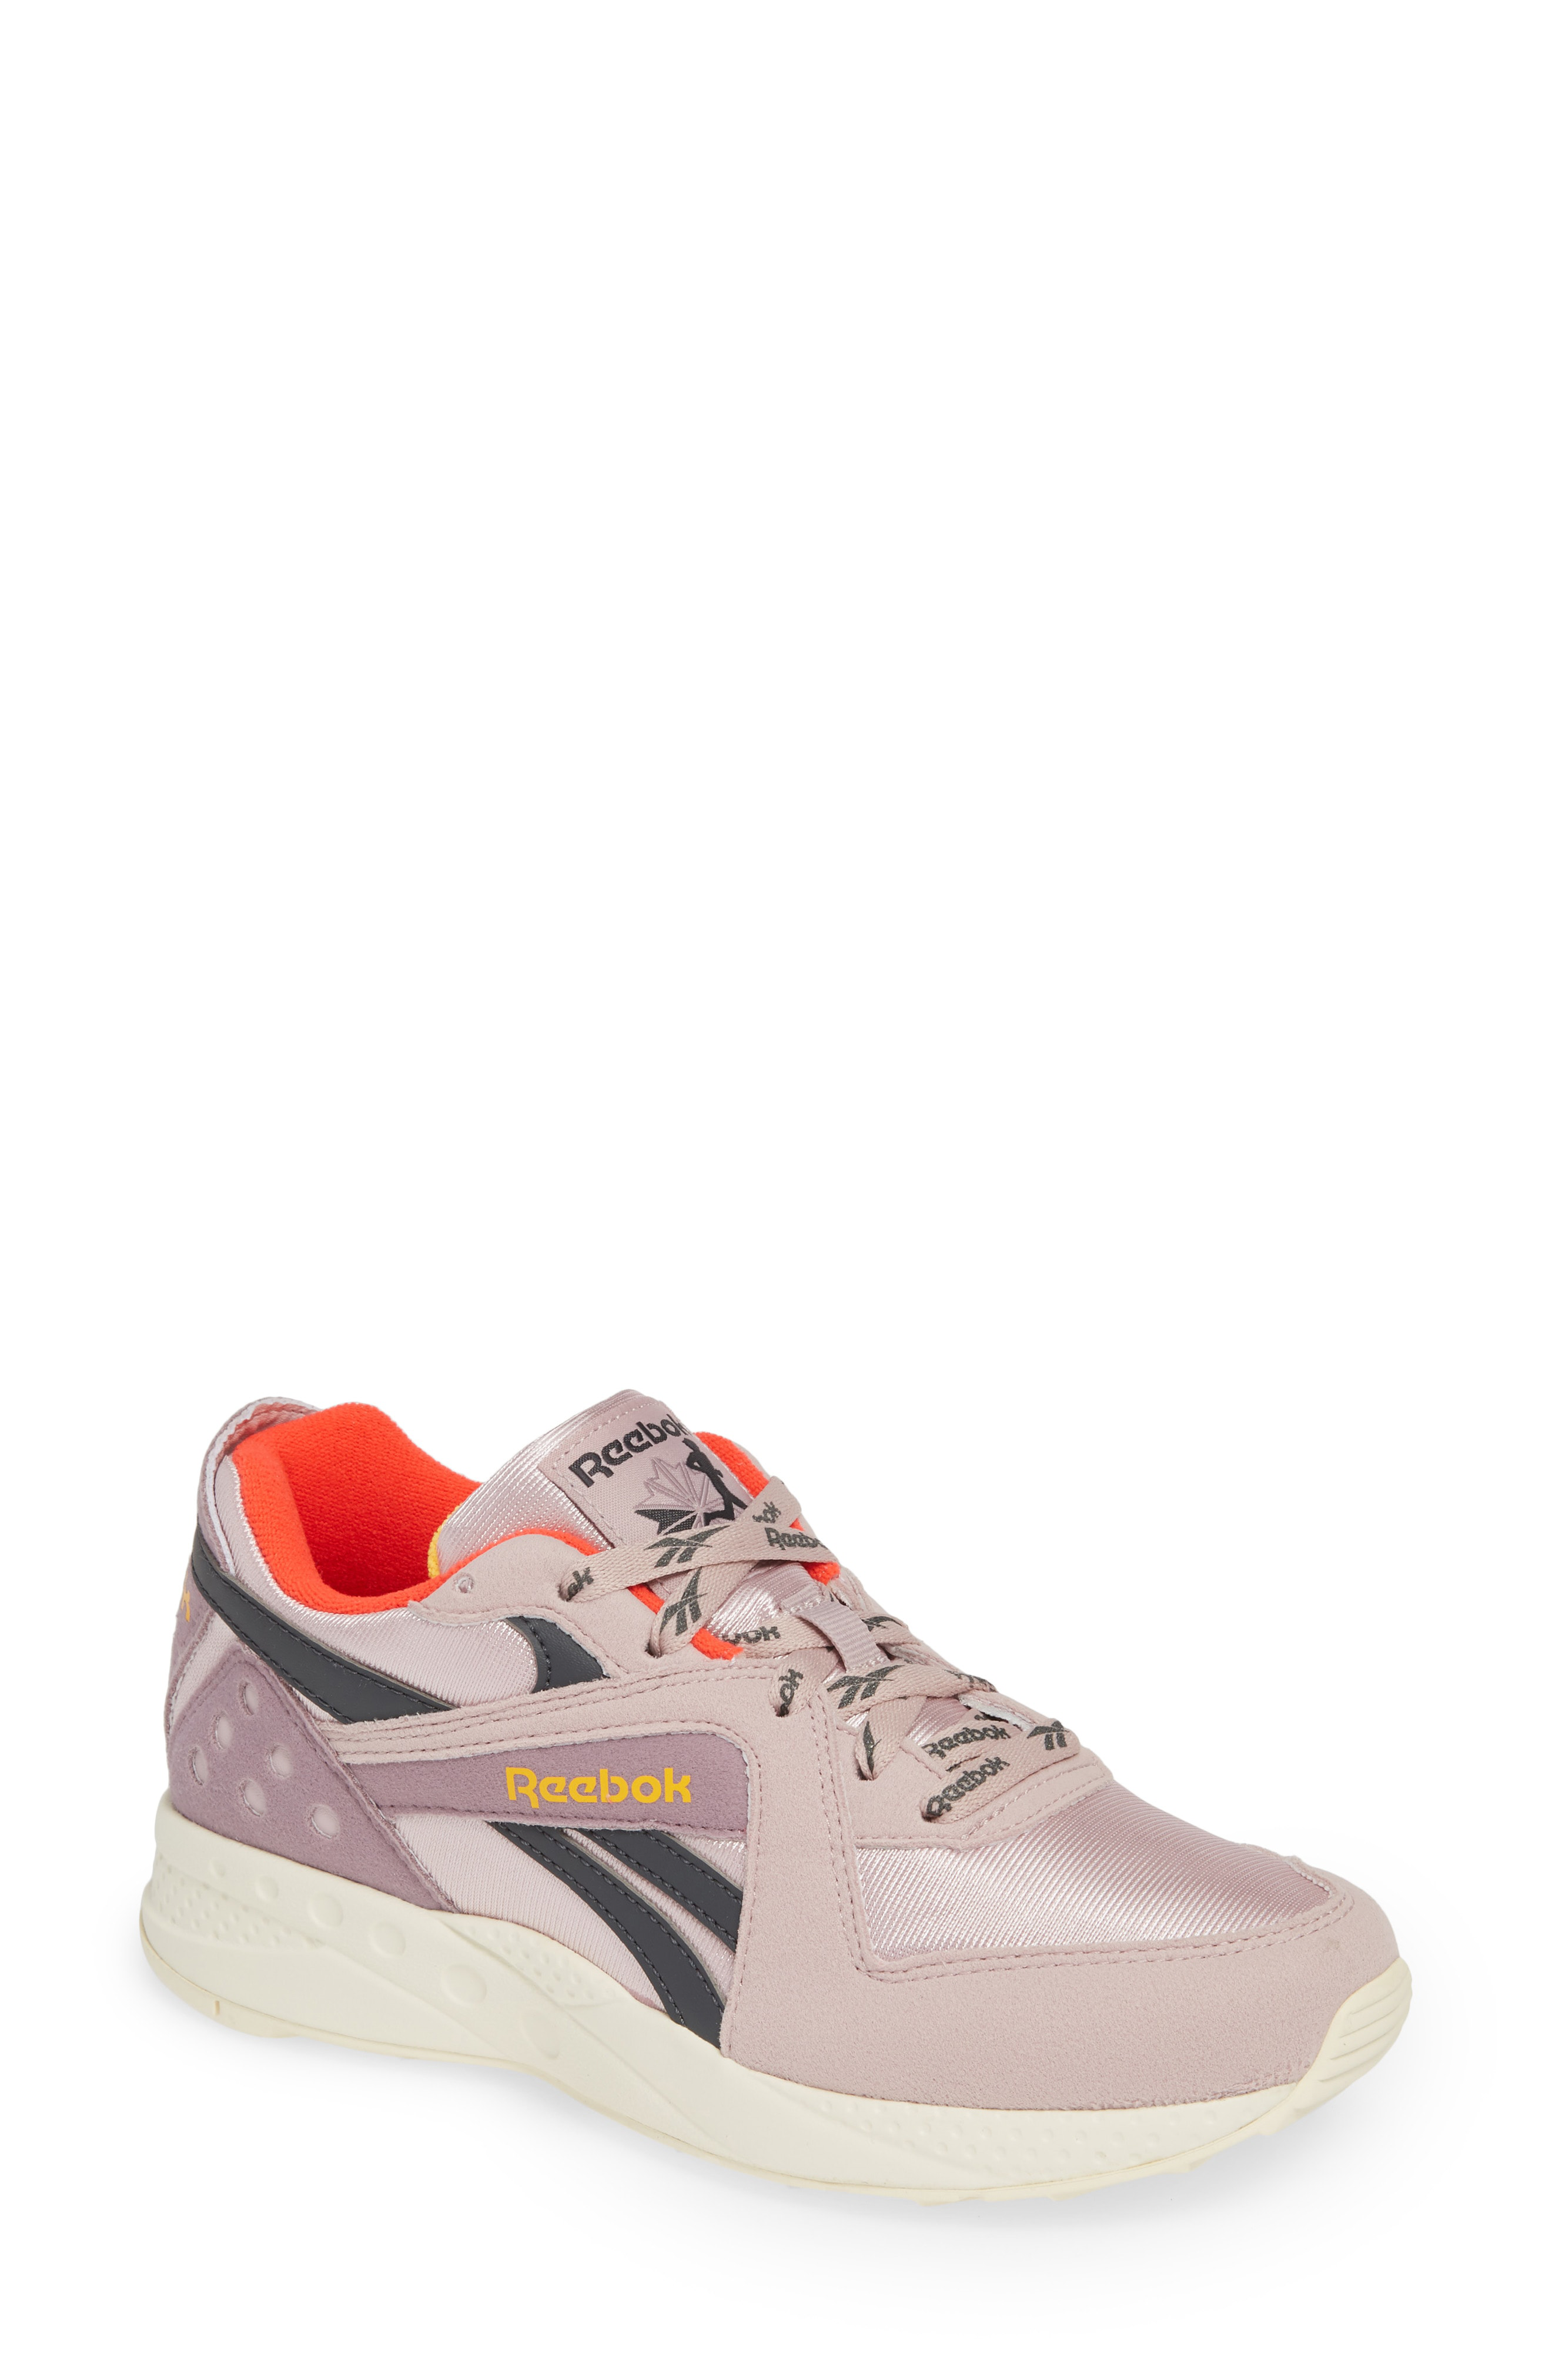 Reebok Pyro Sneaker In Ashen Lilac  Lilac Fog  Grey  920ebd52d